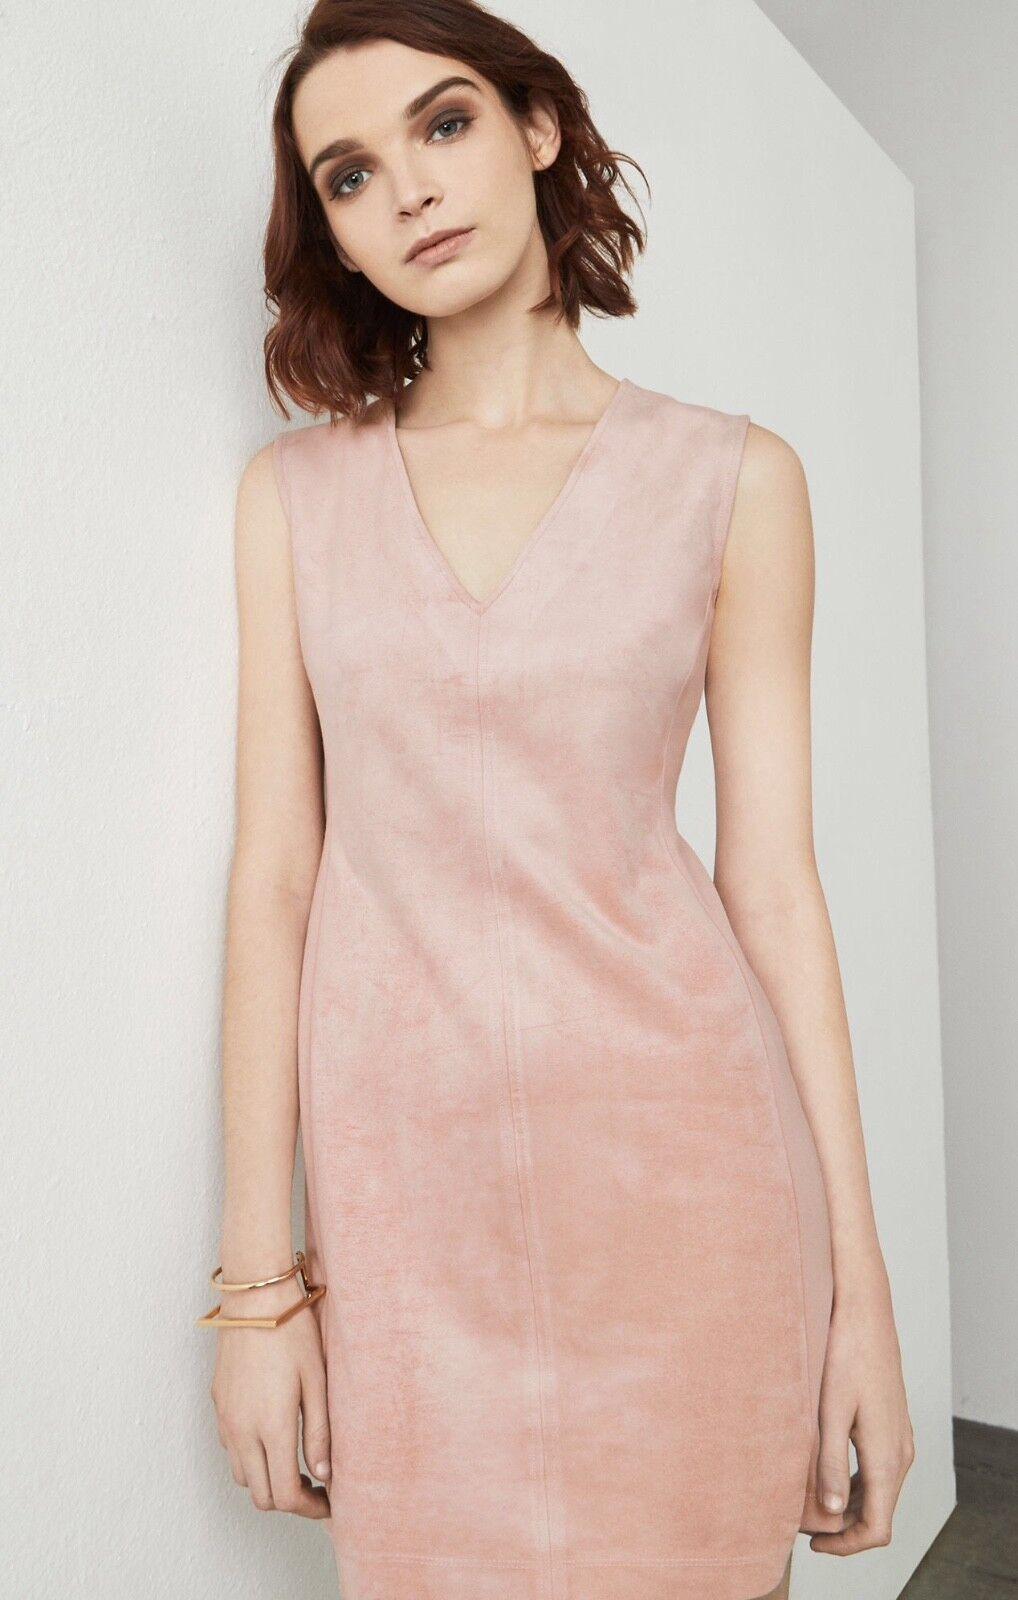 BCBG malina nude pink suede dress, Size XS , NEW. Retail  178